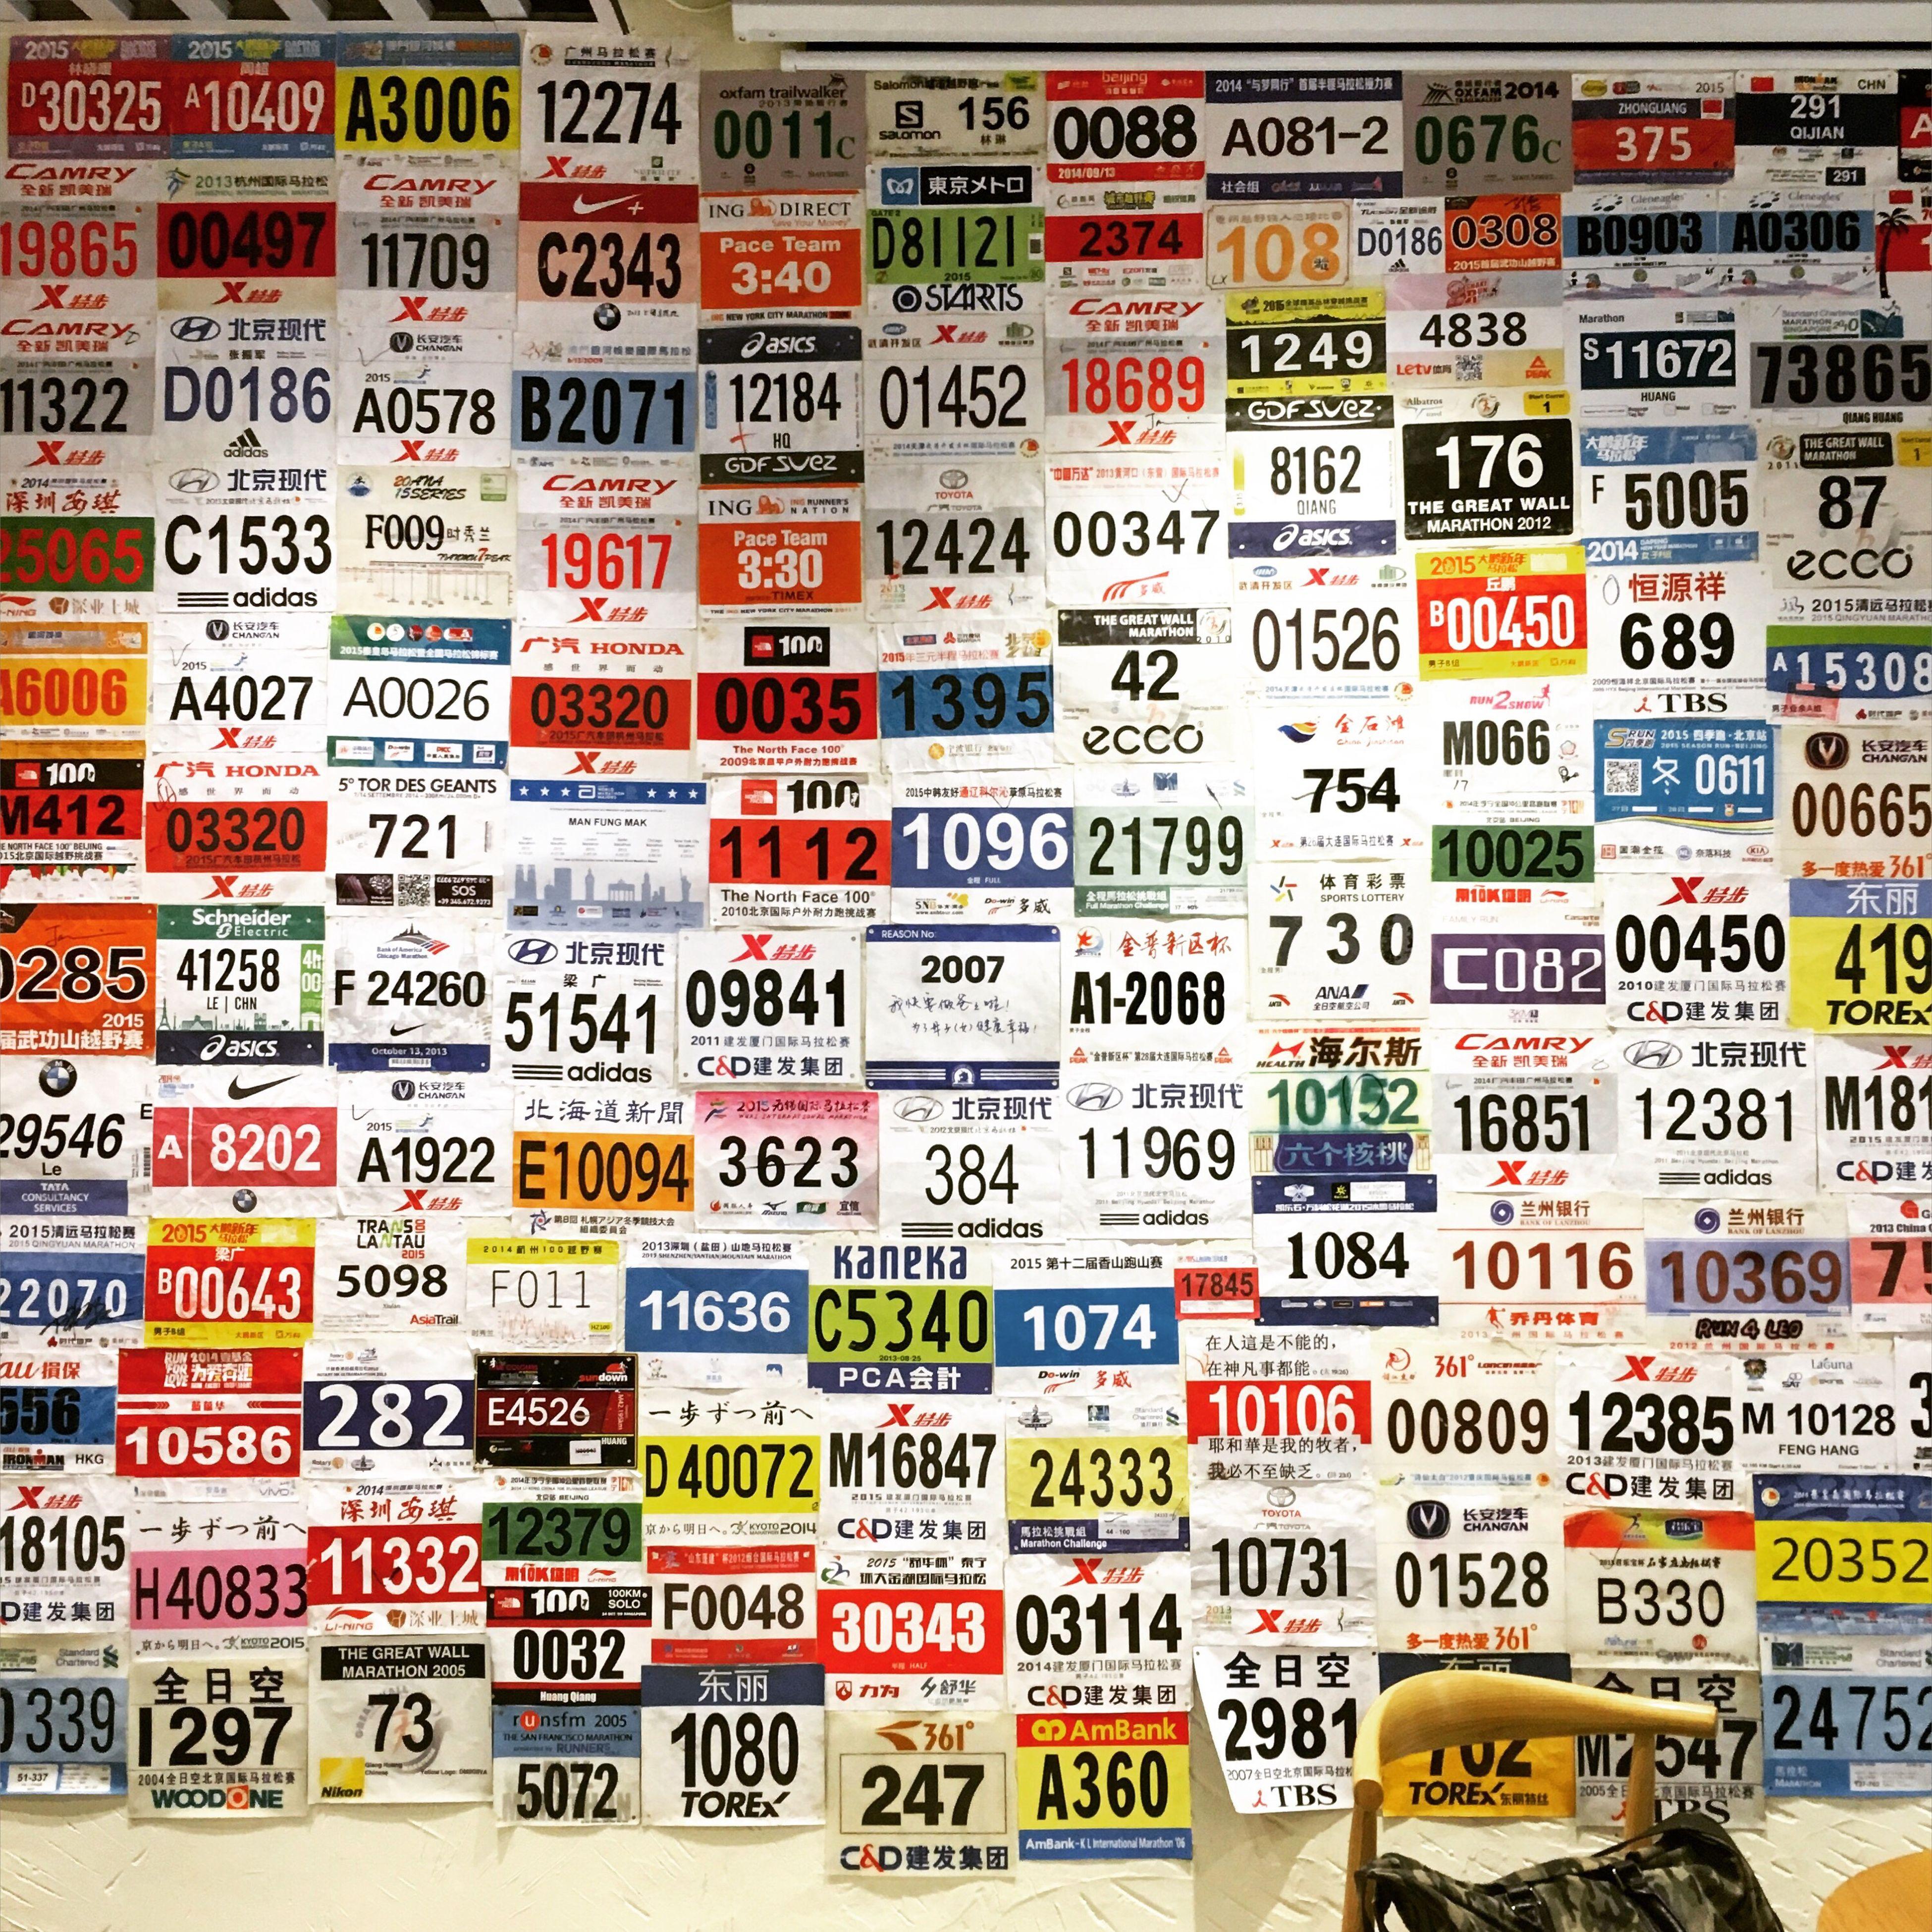 每一個號碼都有一個故事!Every Number has a story🎽👍 Photography Marathon Number Story Colors Run WOW 馬拉松 號碼牌 跑 故事 色彩